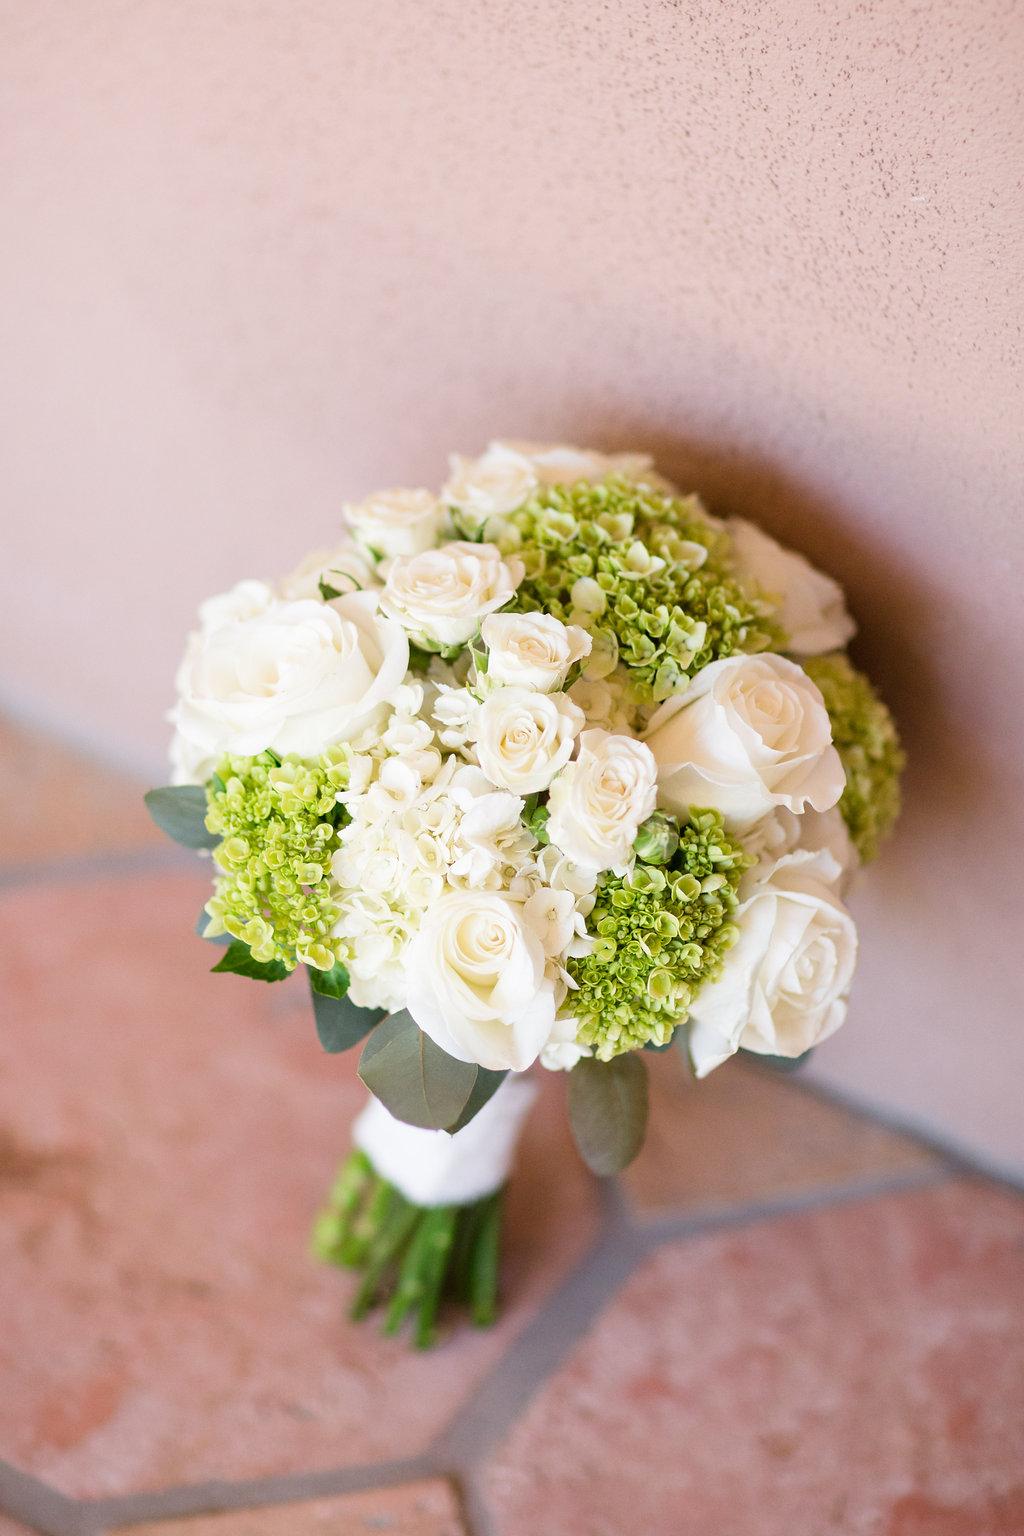 Stevie-and-Jen,-Scottsdale-wedding-photographer,-leah-barry-photography-6.jpg